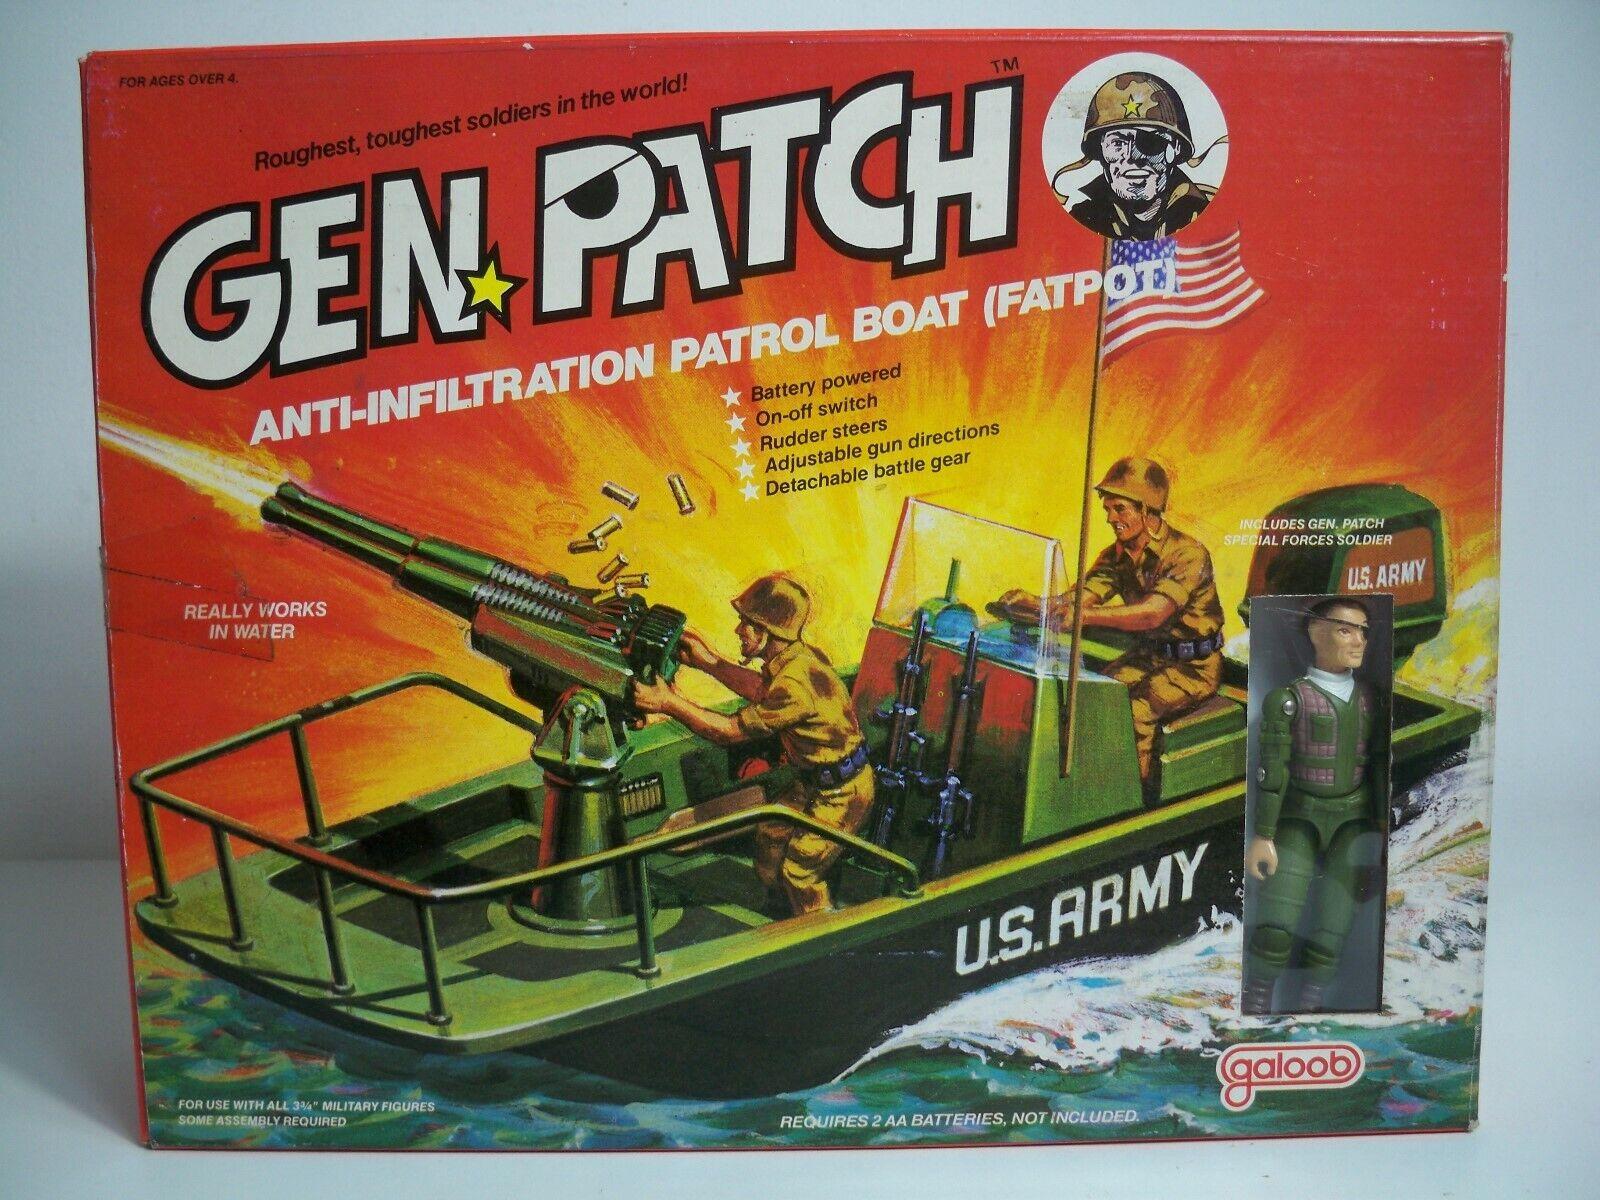 K190026 ANTI-INFILTRATION PATROL BOAT MIB MINT IN BOX GEN PATCH 1983 GALOOB